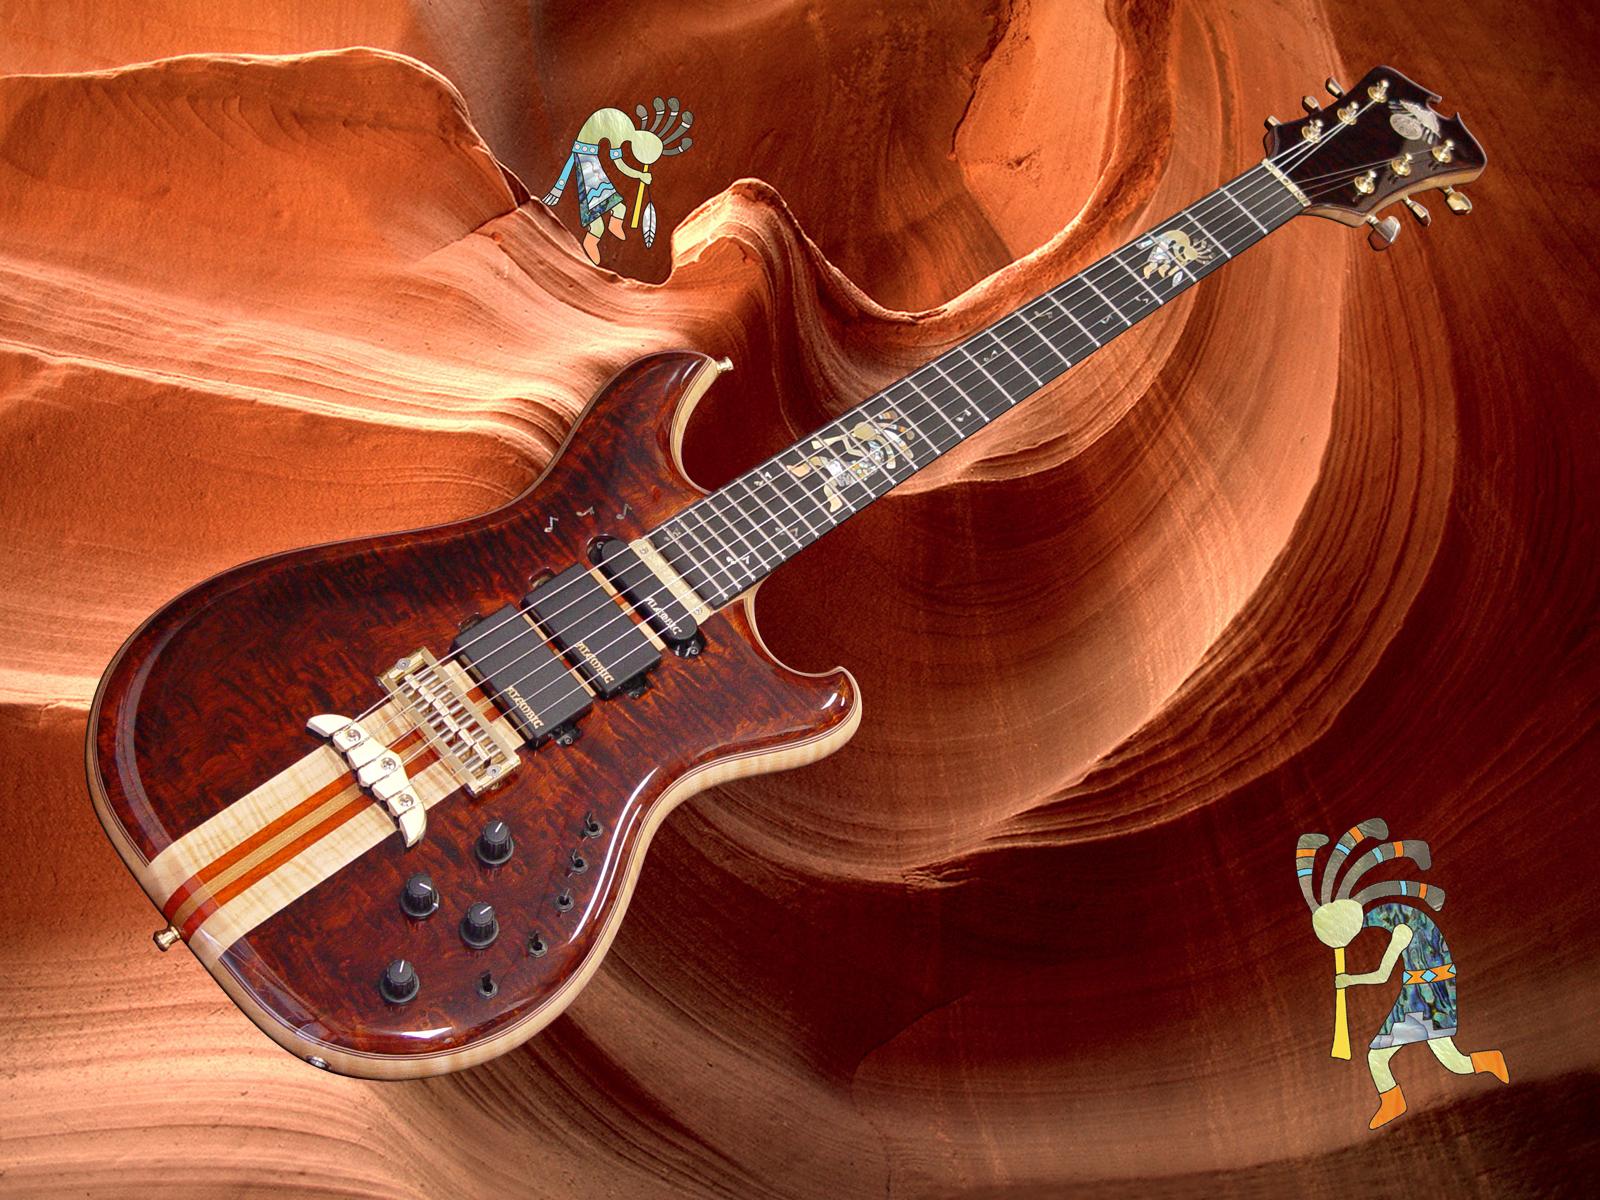 Guitare Fond d'écran and Arrière-Plan   1600x1200   ID:422181 - Wallpaper Abyss